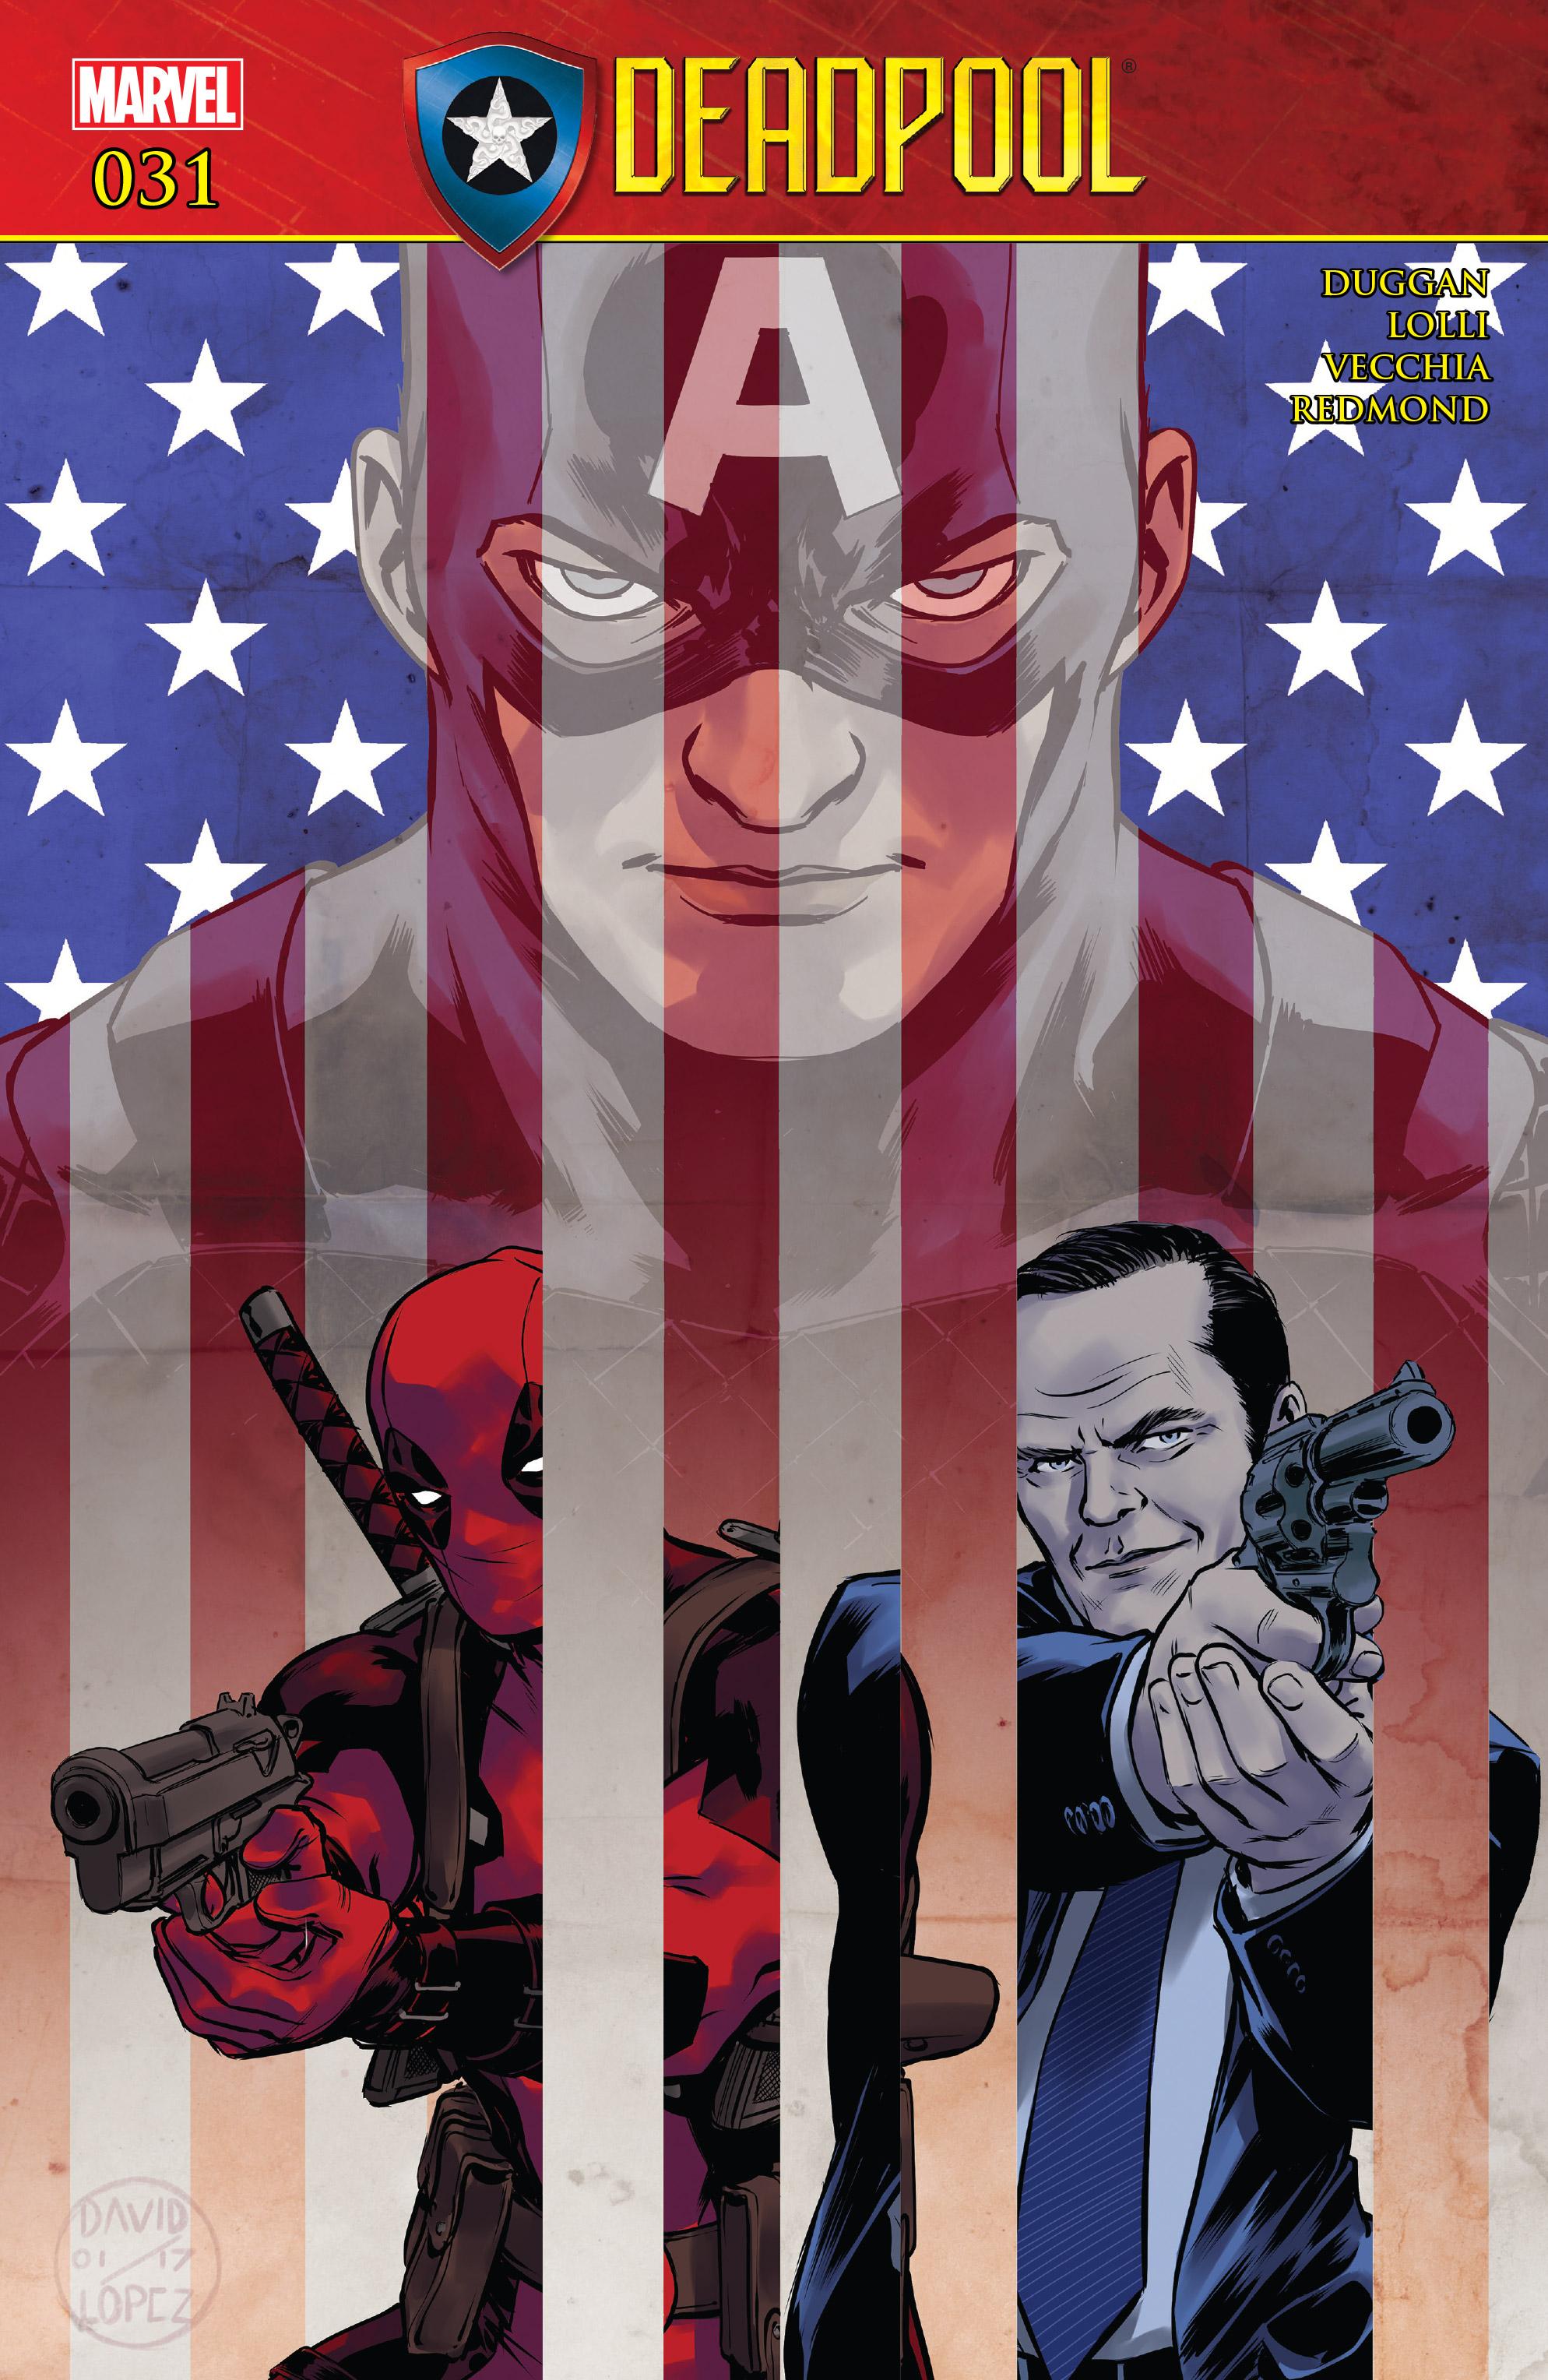 Read online Deadpool (2016) comic -  Issue #31 - 1